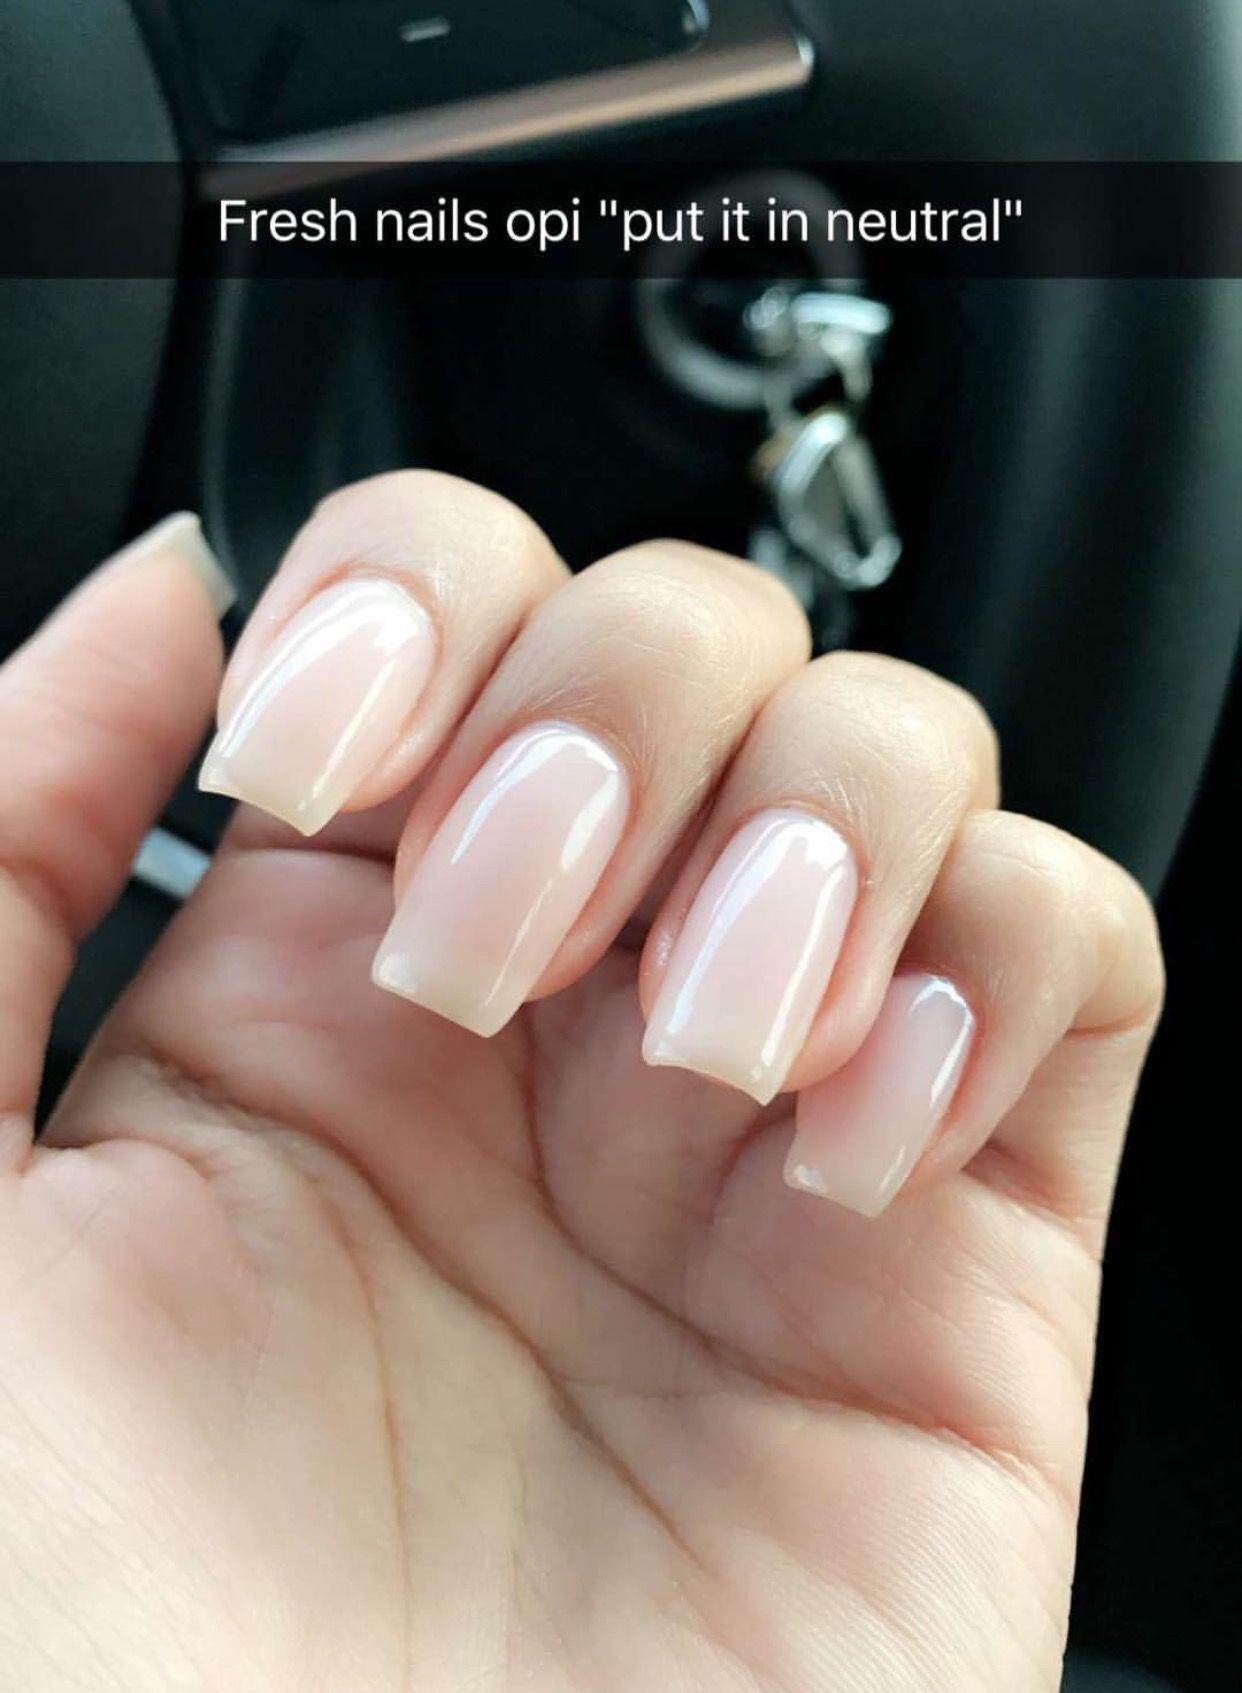 Pinterest Chandlerjocleve Instagram Chandlercleveland Ombre Acrylic Nails Shellac Nail Polish Cute Acrylic Nails